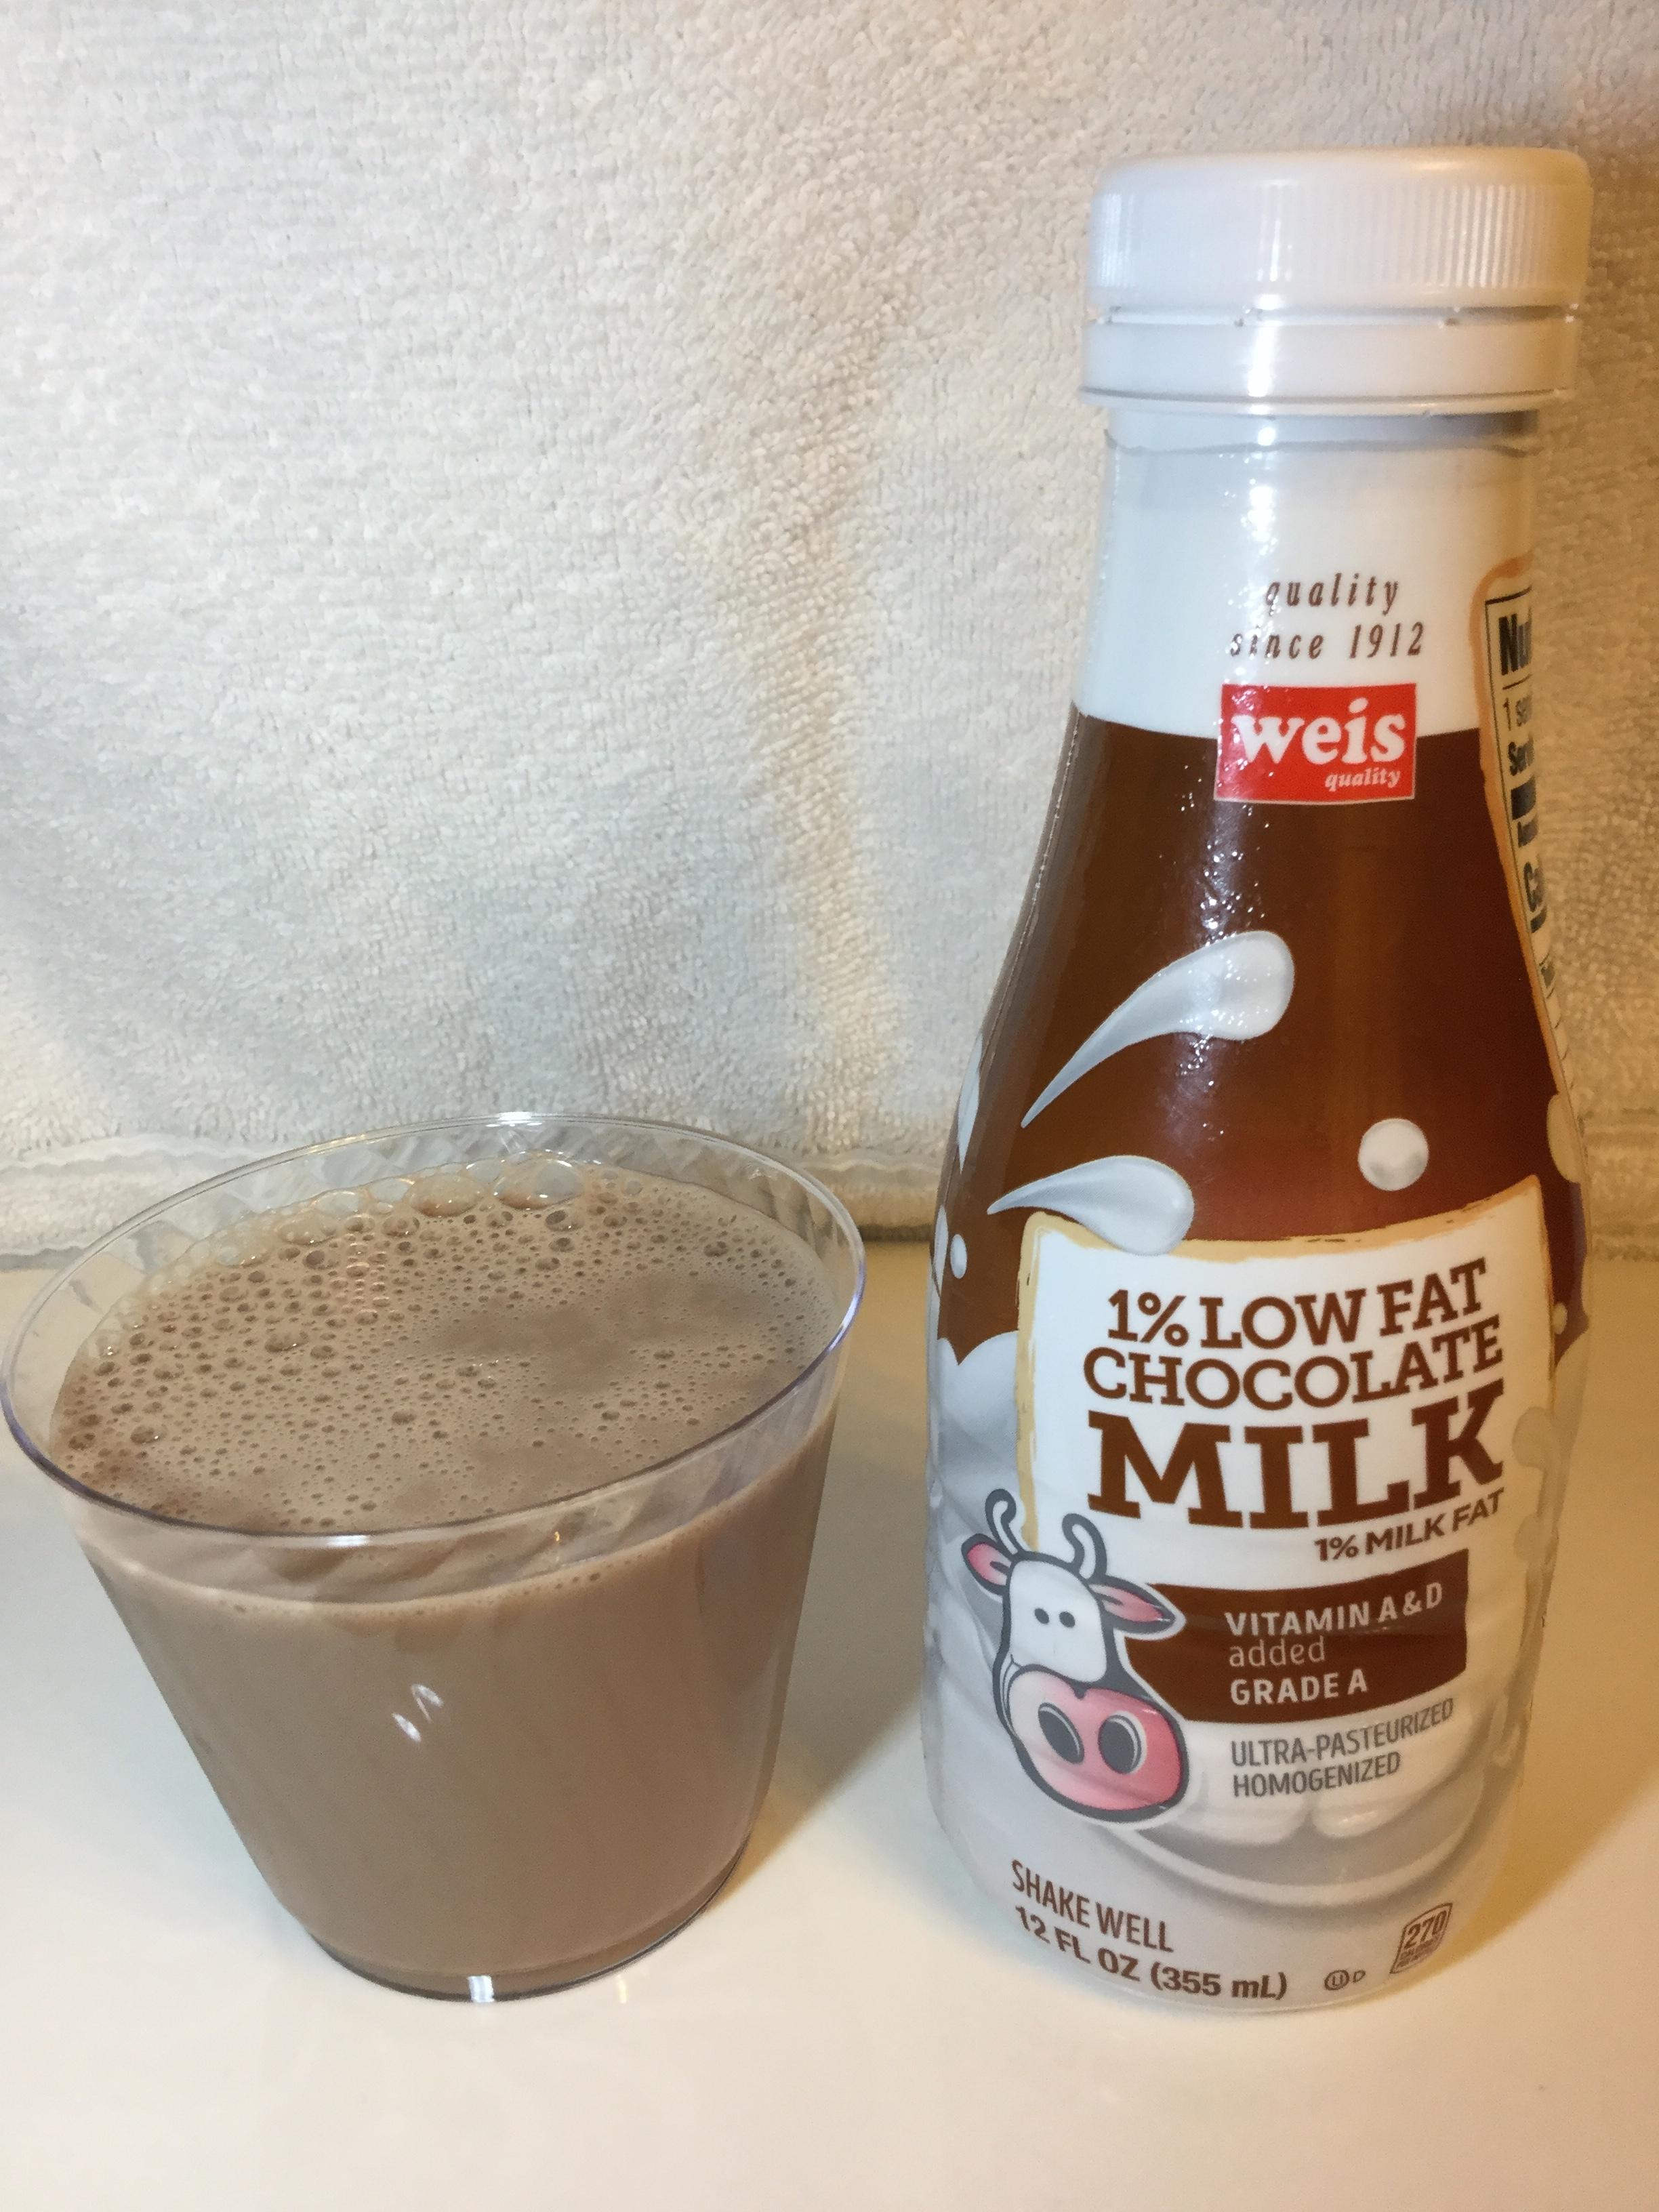 Weis Lowfat Chocolate Milk Cup